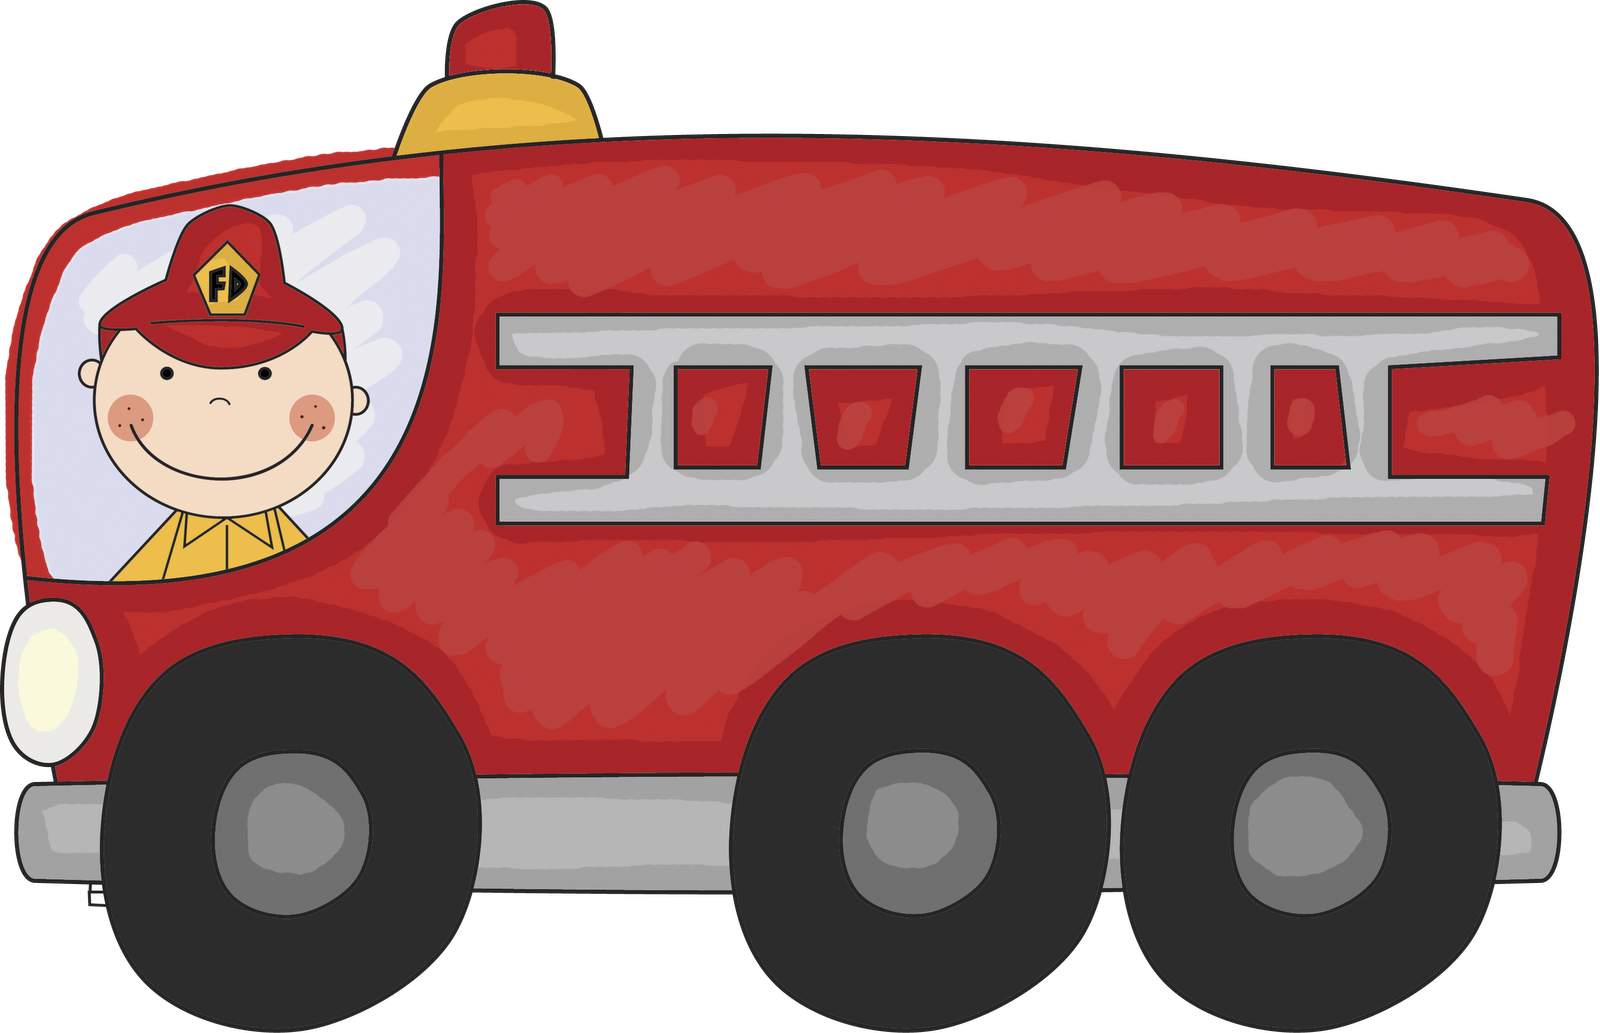 Vintage Fire Truck Clipart Clipart Panda-Vintage Fire Truck Clipart Clipart Panda Free Clipart Images-9